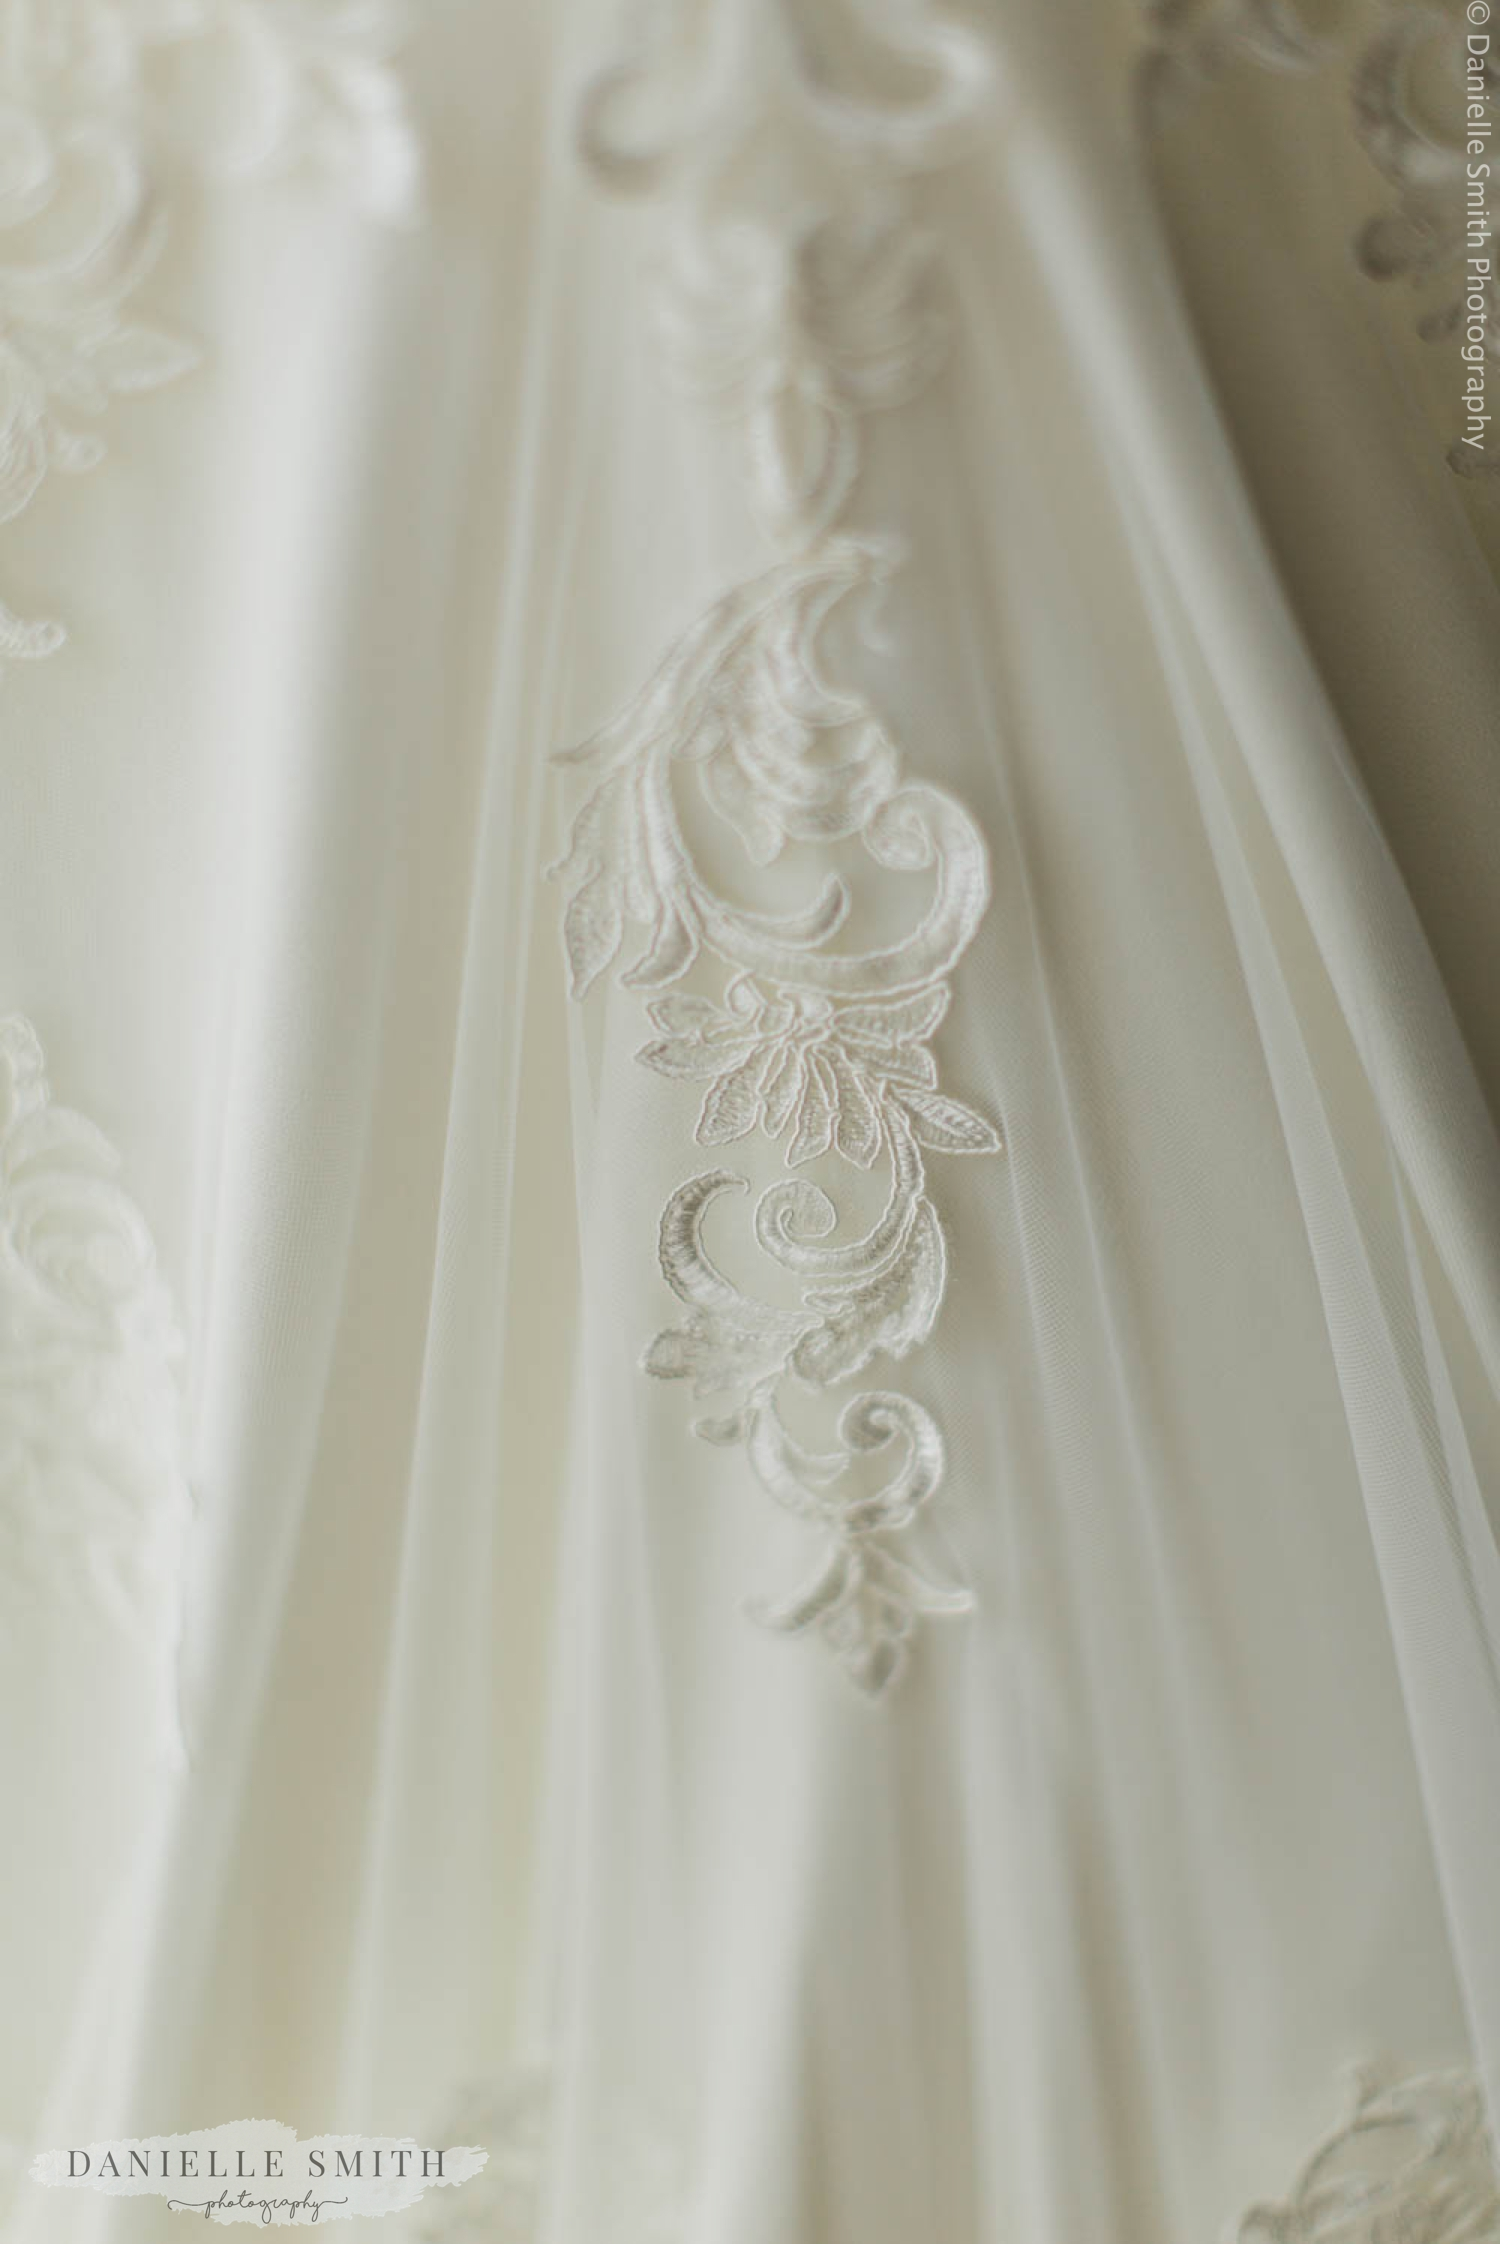 lace detail on wedding dress